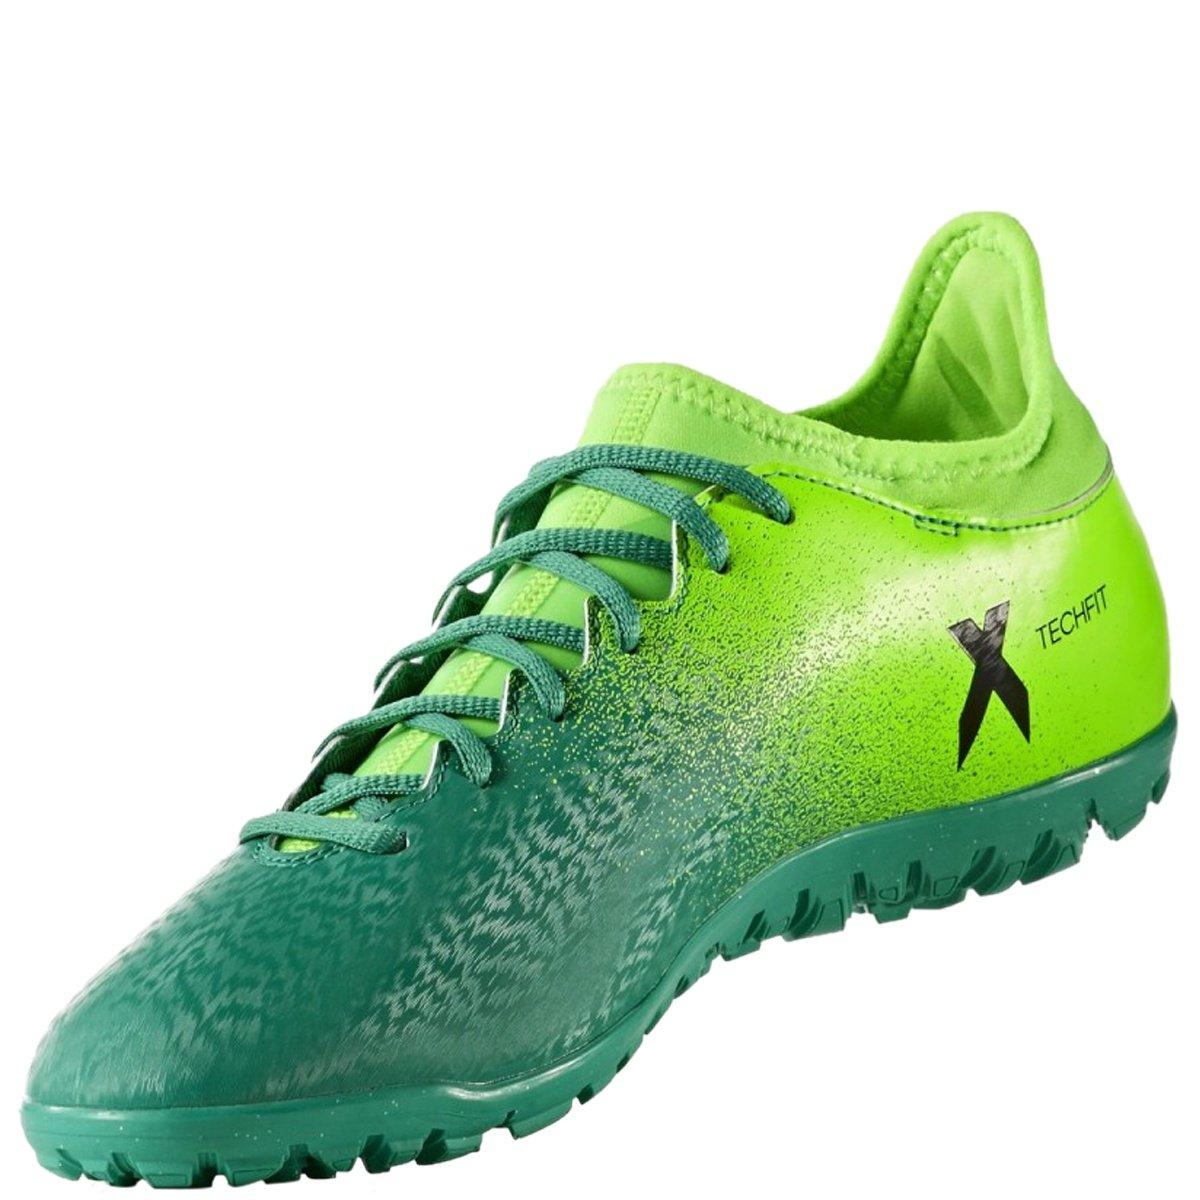 3ebb28d13c3c3 Bizz Store - Chuteira Society Adidas X 16.3 TF Masculina Verde